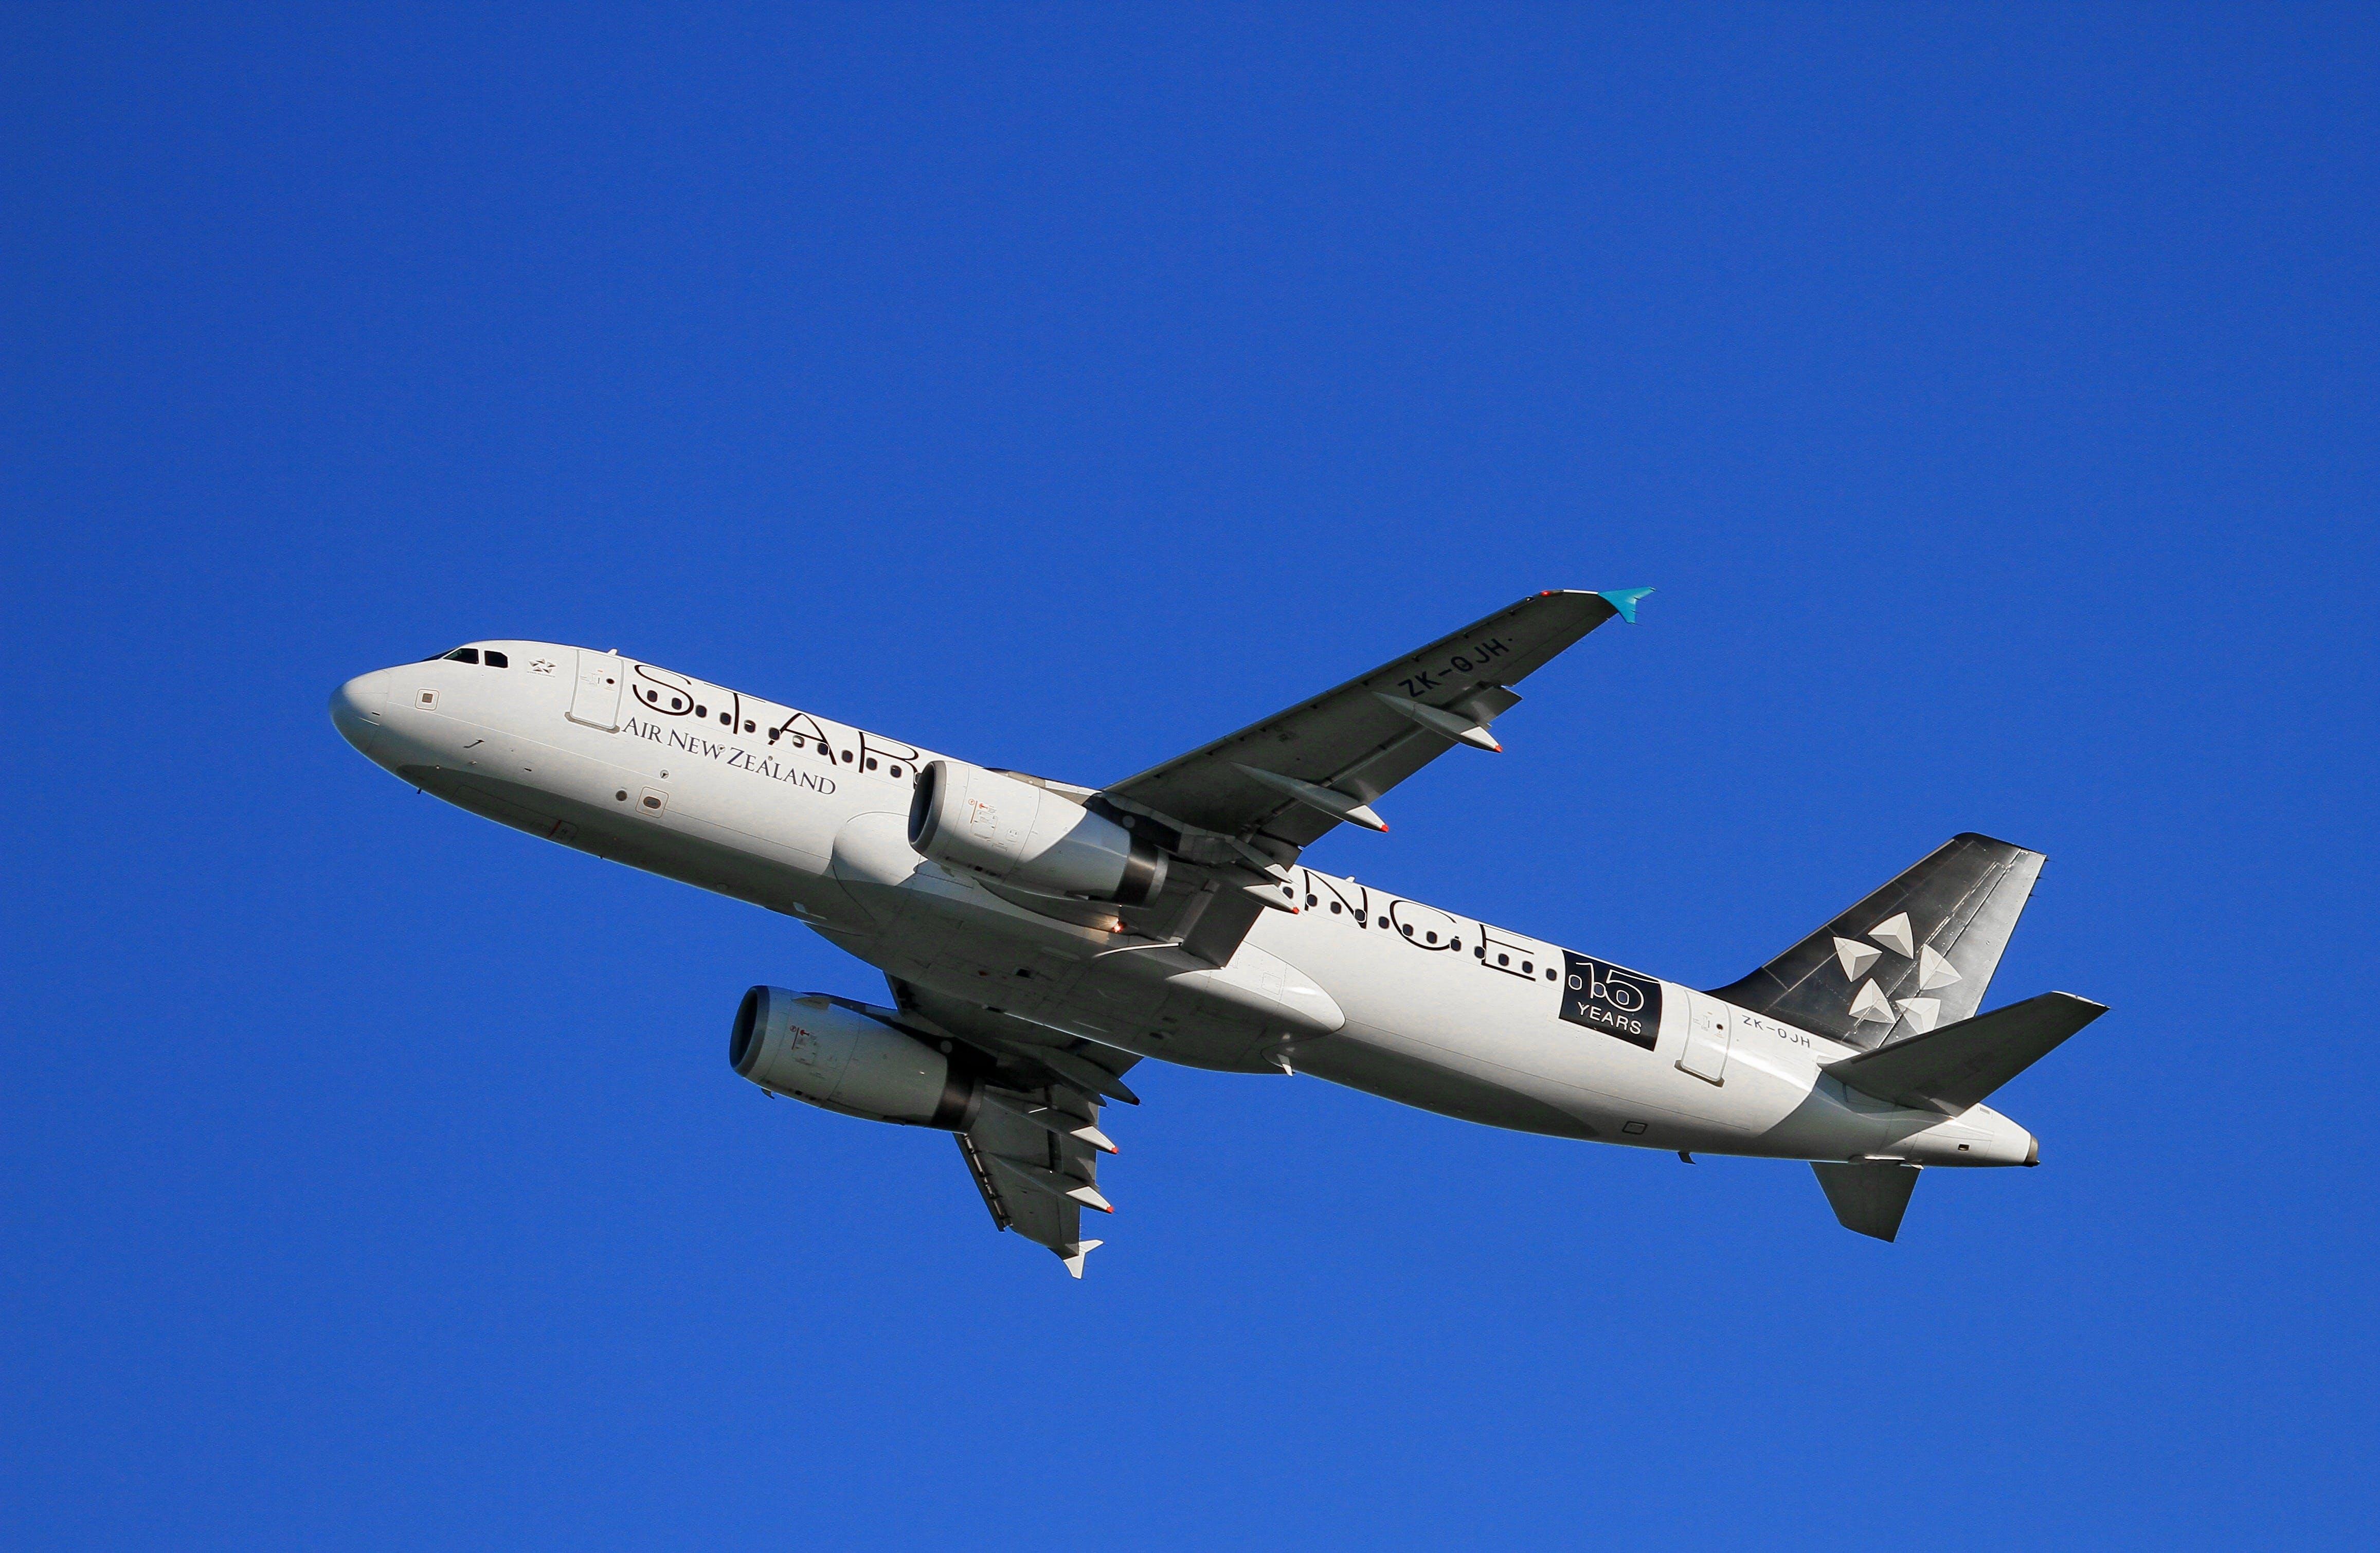 White Airplane Under Blue Sky at Daytime